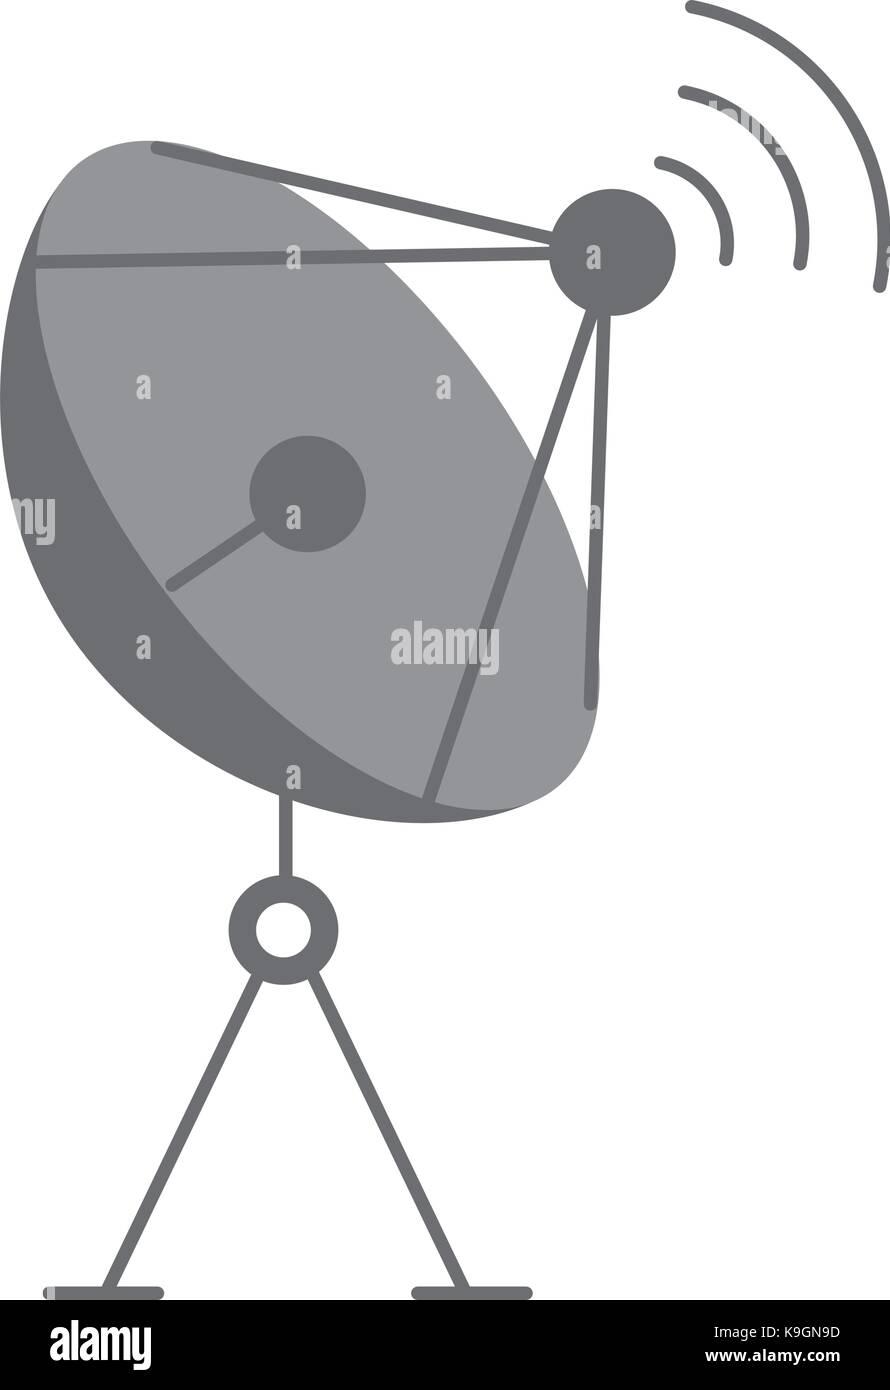 radar dish antenna for broadcast communication vector illustration - Stock Image